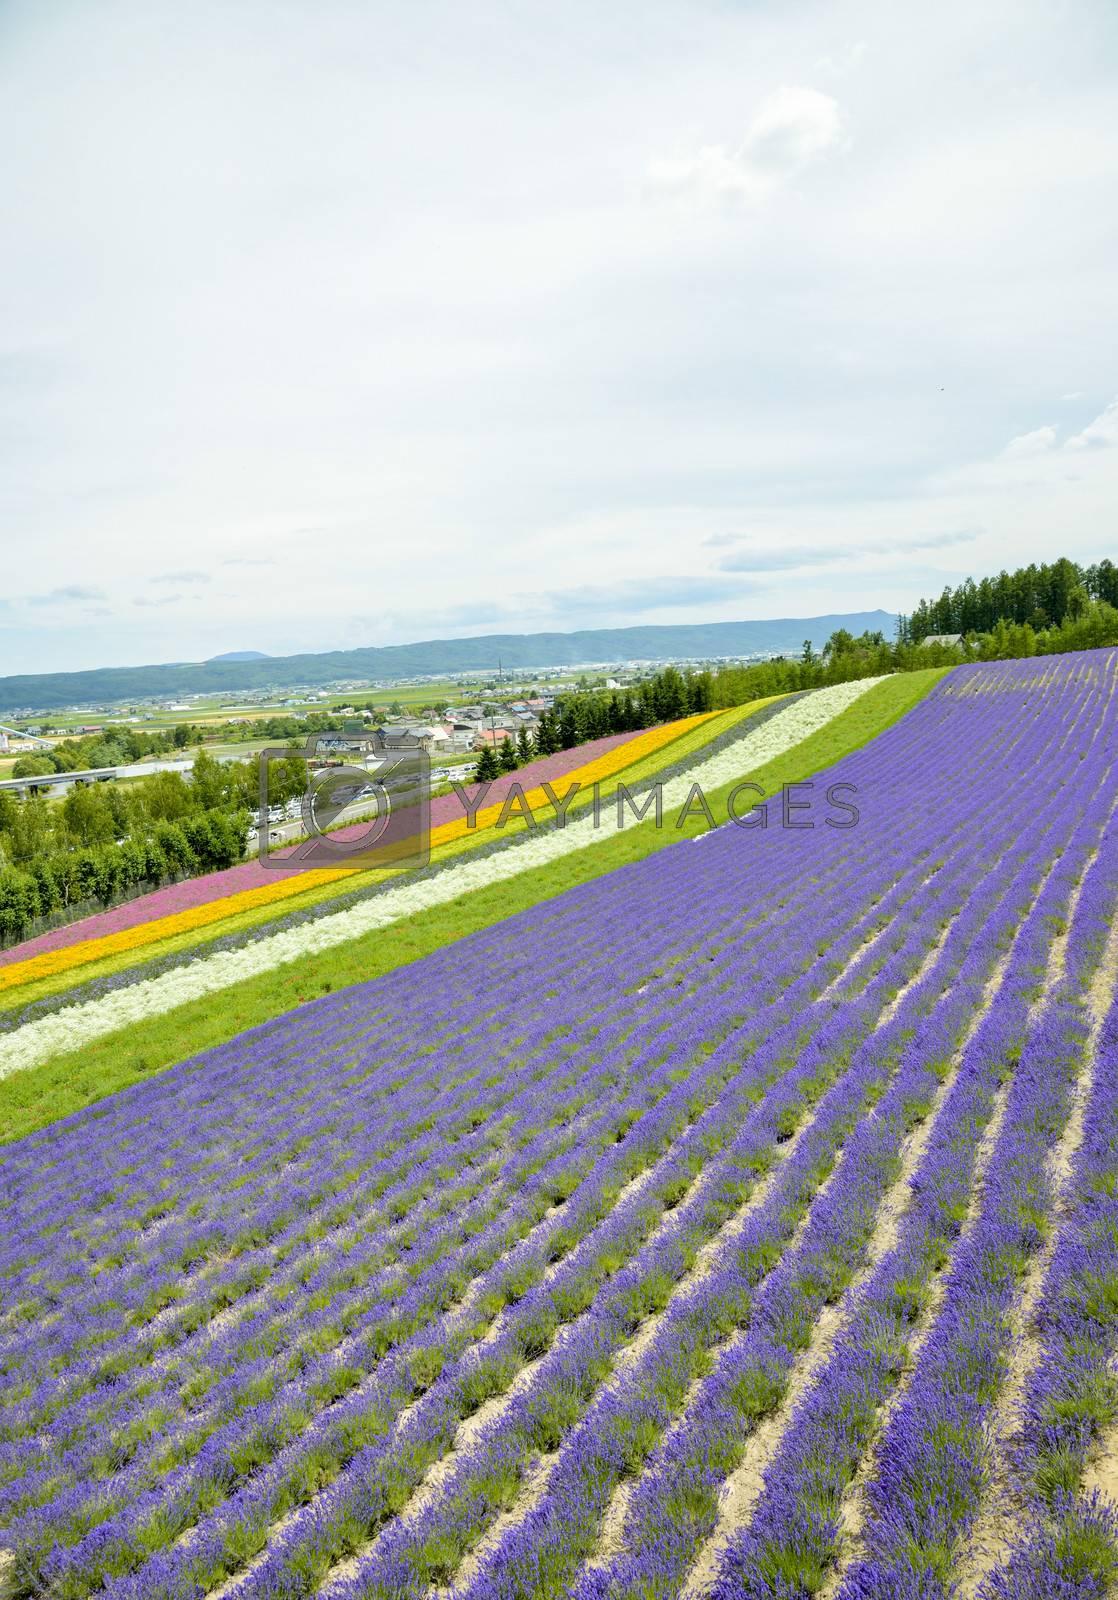 Colorful Lavender farm15